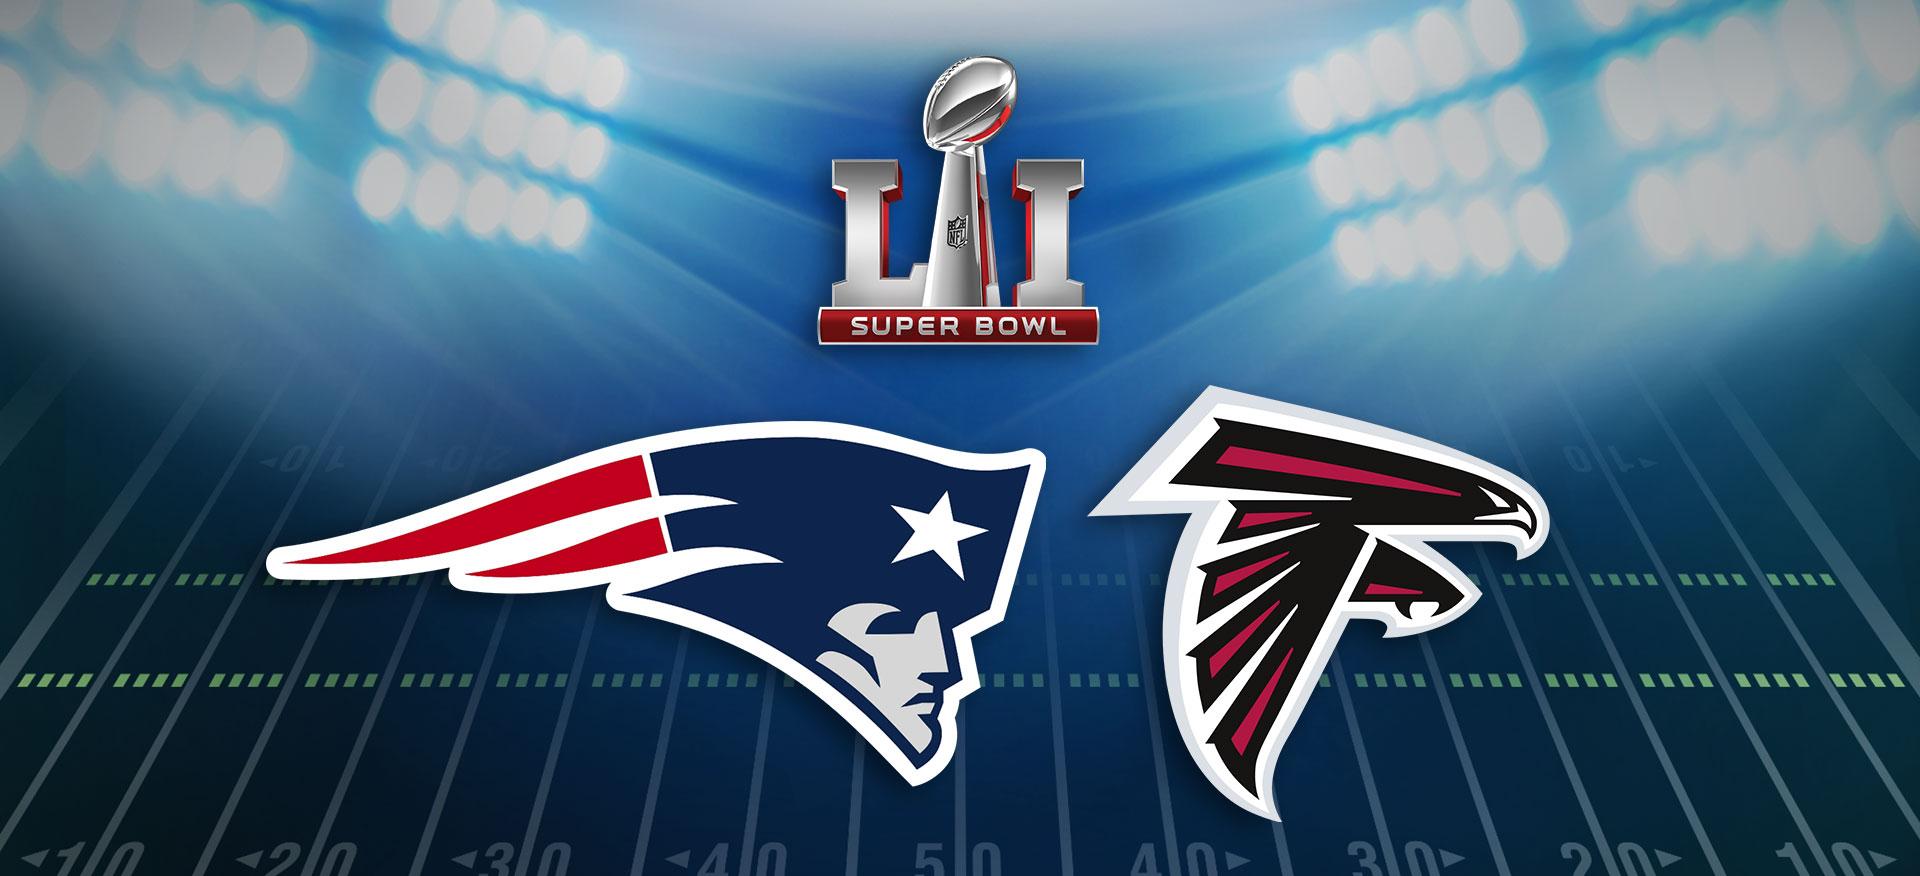 Falcons Arrive For 1st Super Bowl Appearance Since 1999